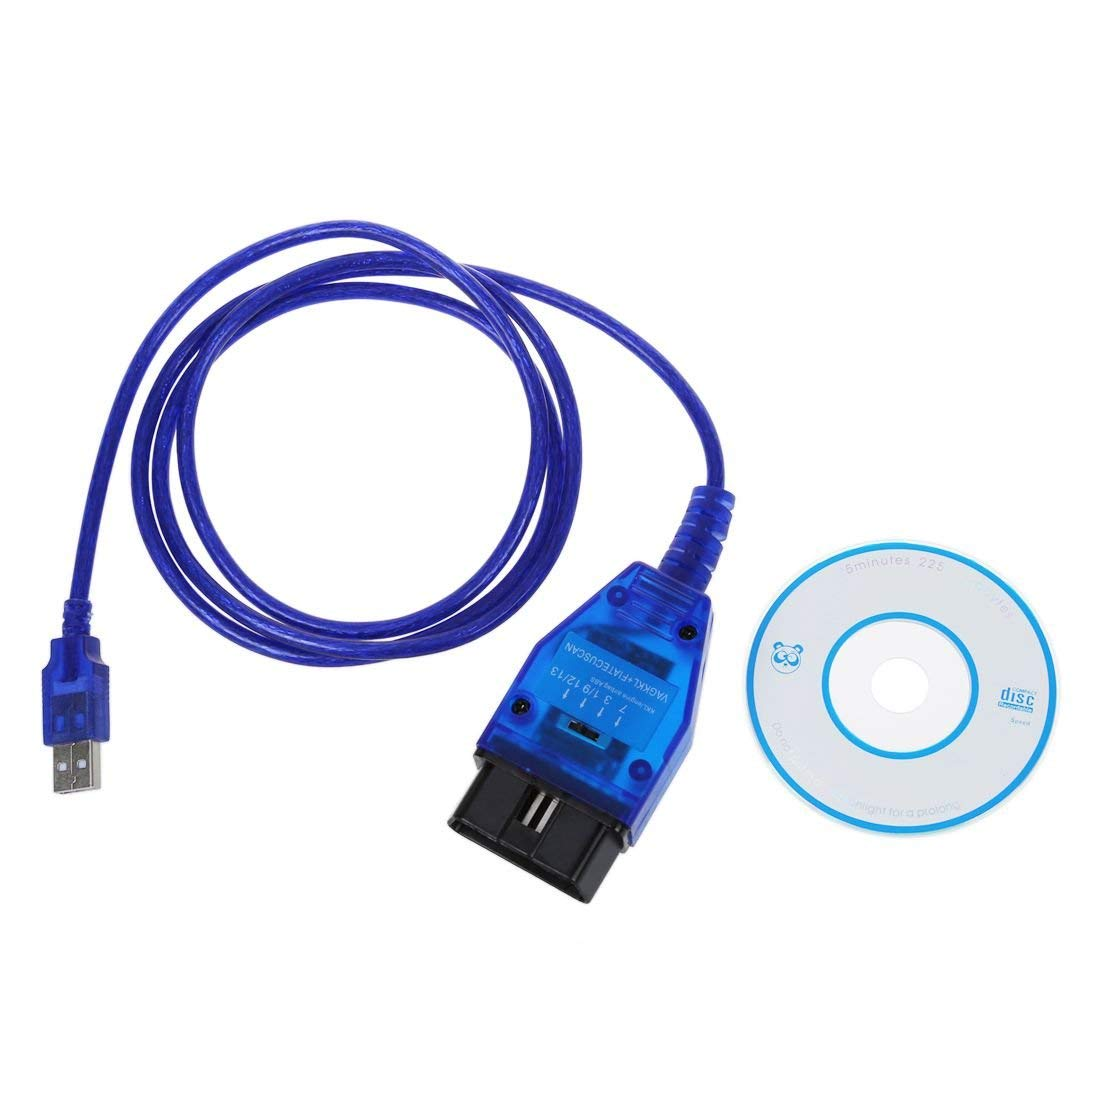 ULTRAOBD2 Fiatecuscan KKL 409.1 Interruptor MultiECUScan para Italia Veh/ículo